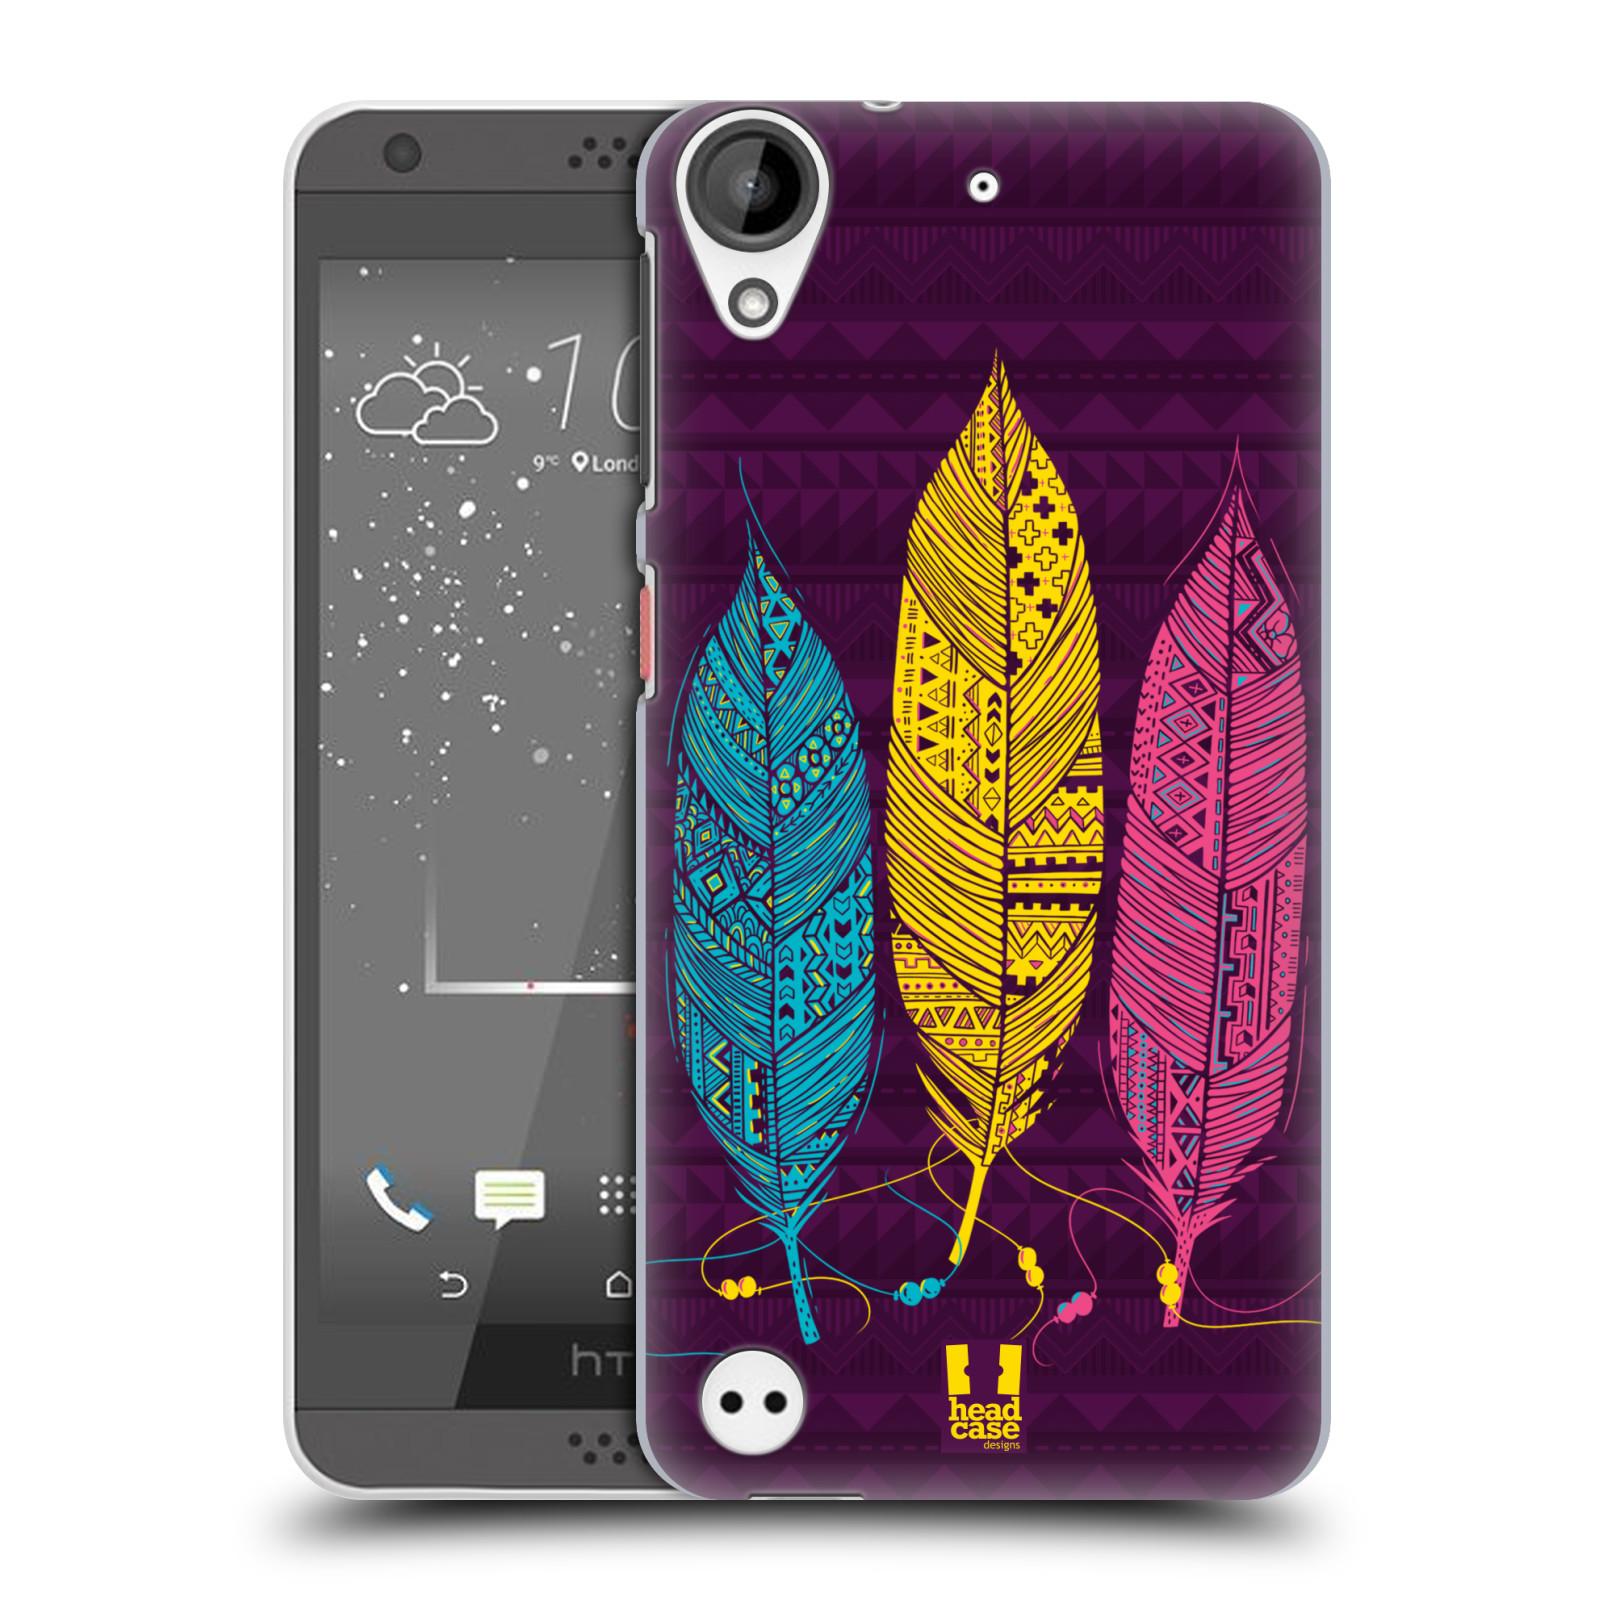 Plastové pouzdro na mobil HTC Desire 530 HEAD CASE AZTEC PÍRKA 3 BAREV